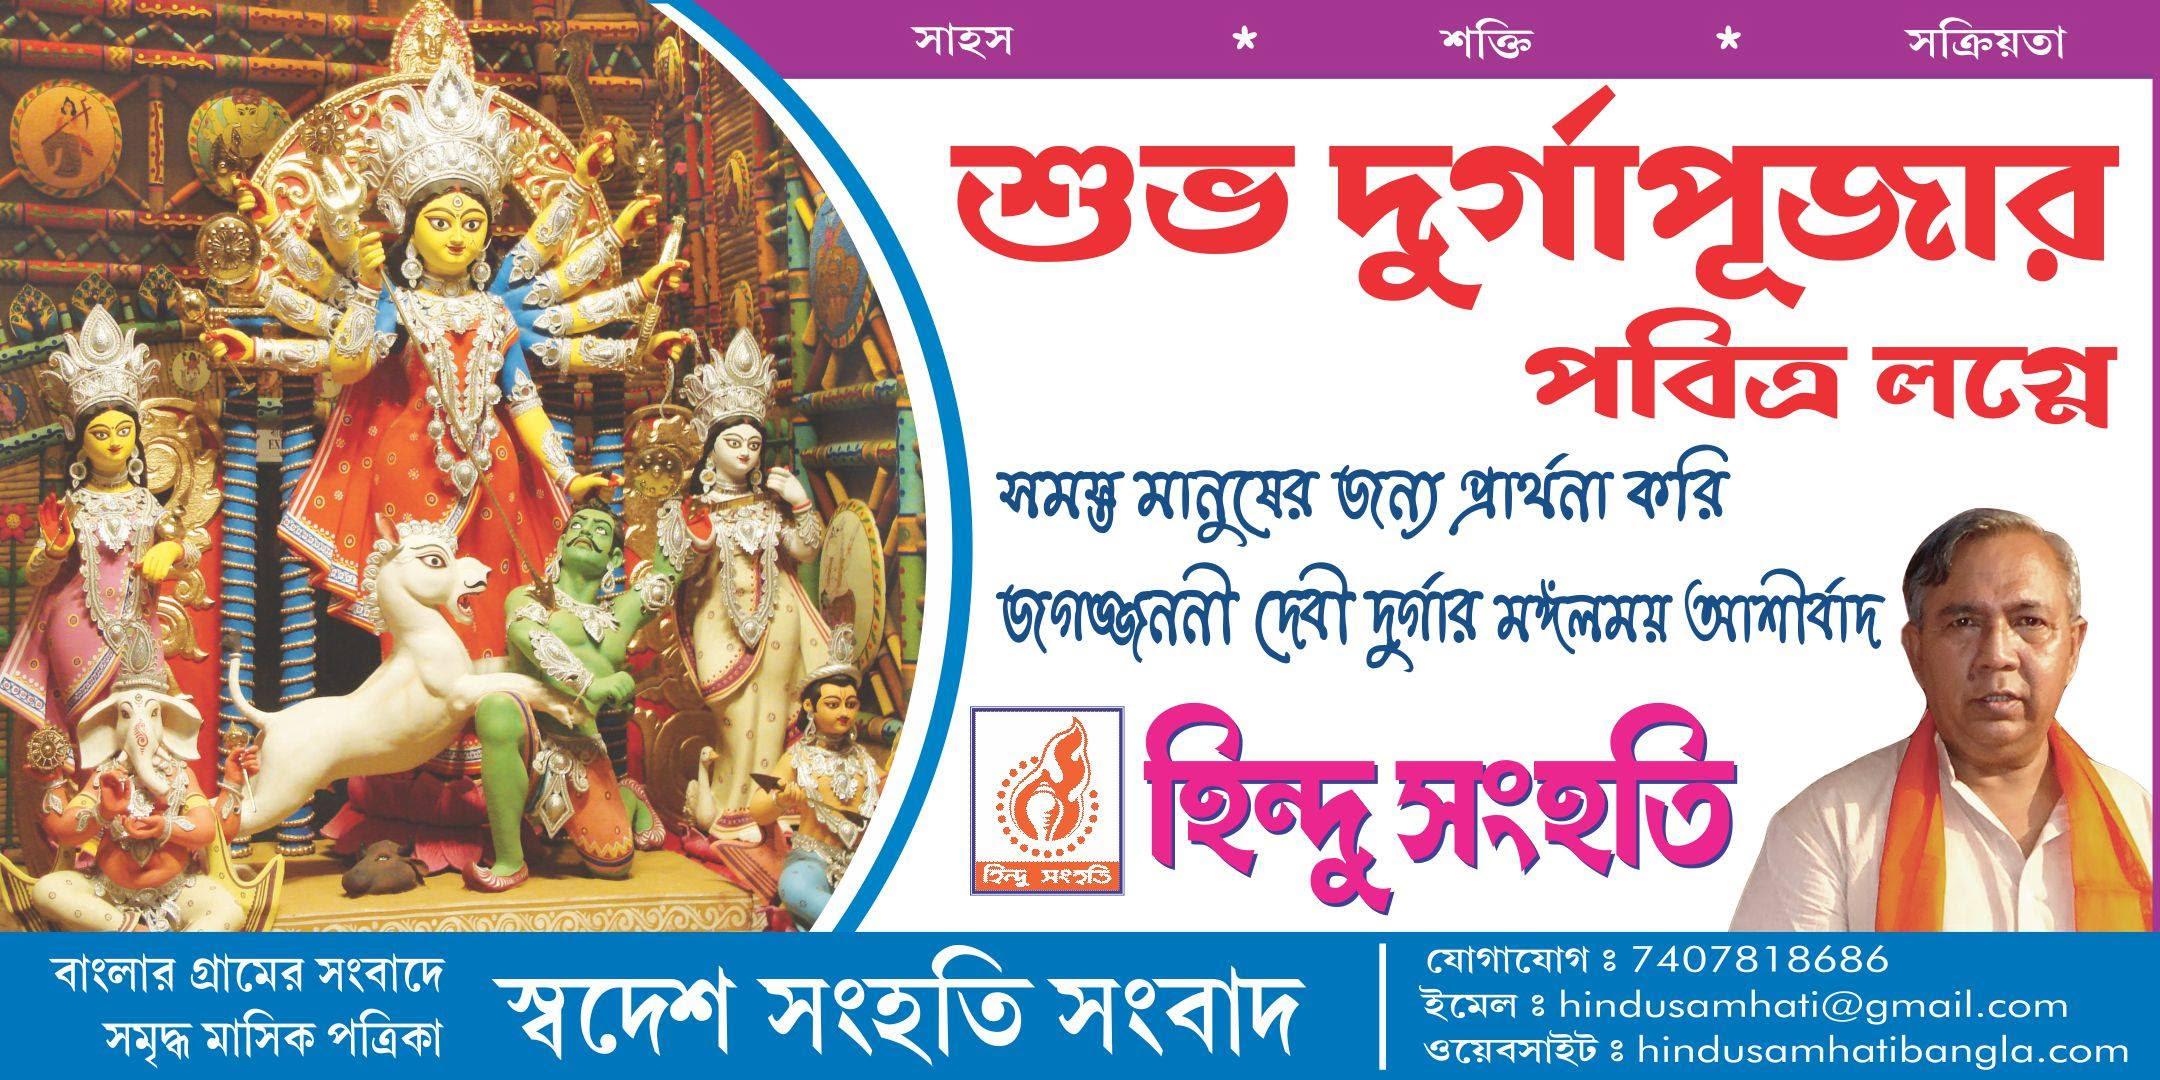 Durga puja greetings and inspiring updates from west bengal may maa durga bless all on maha saptami m4hsunfo